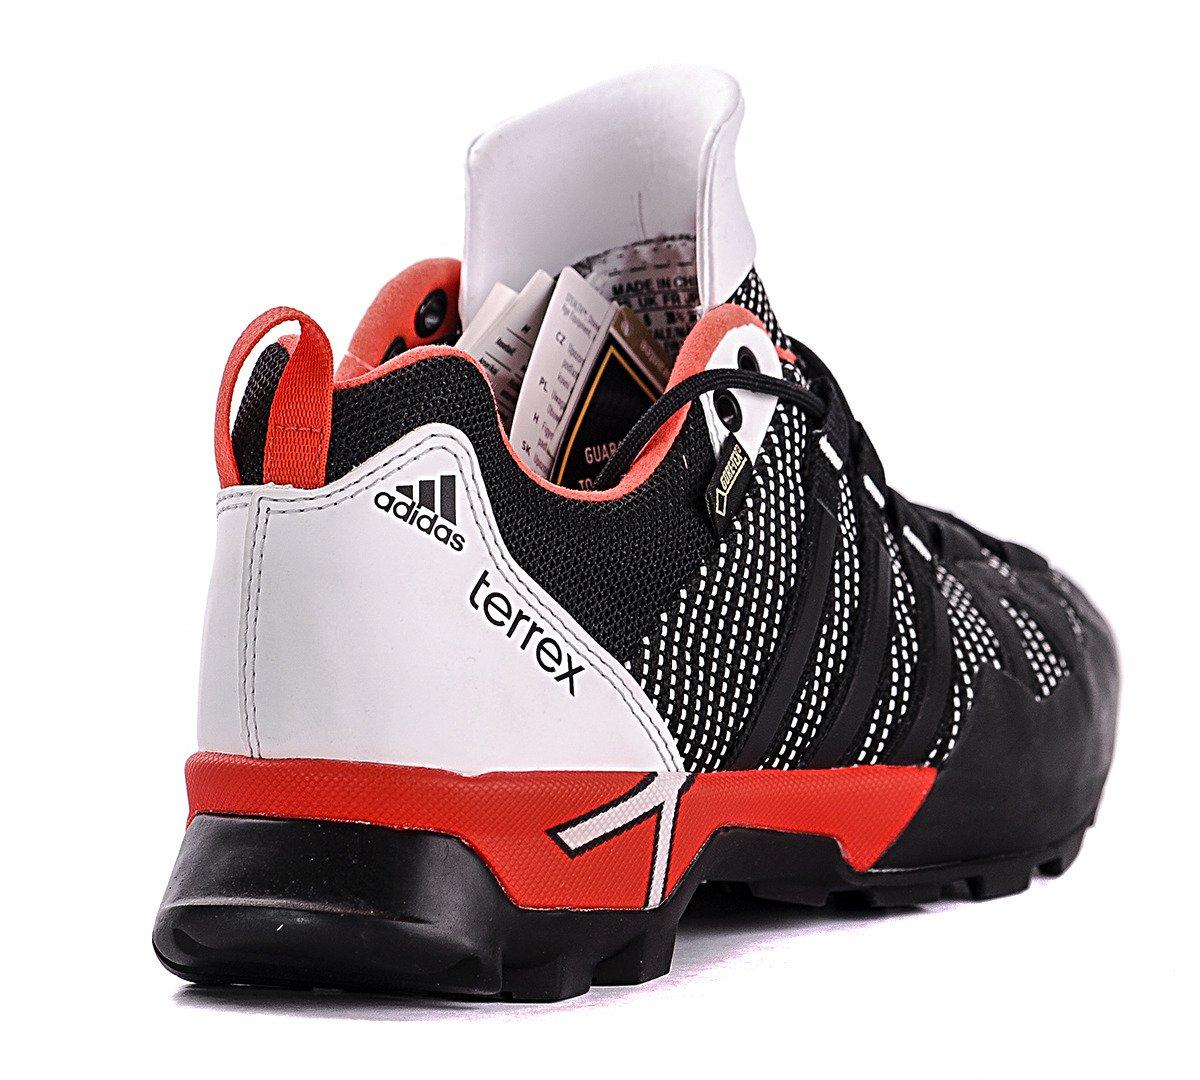 Adidas outdoor Terrex Scope GTX Hiking Shoes